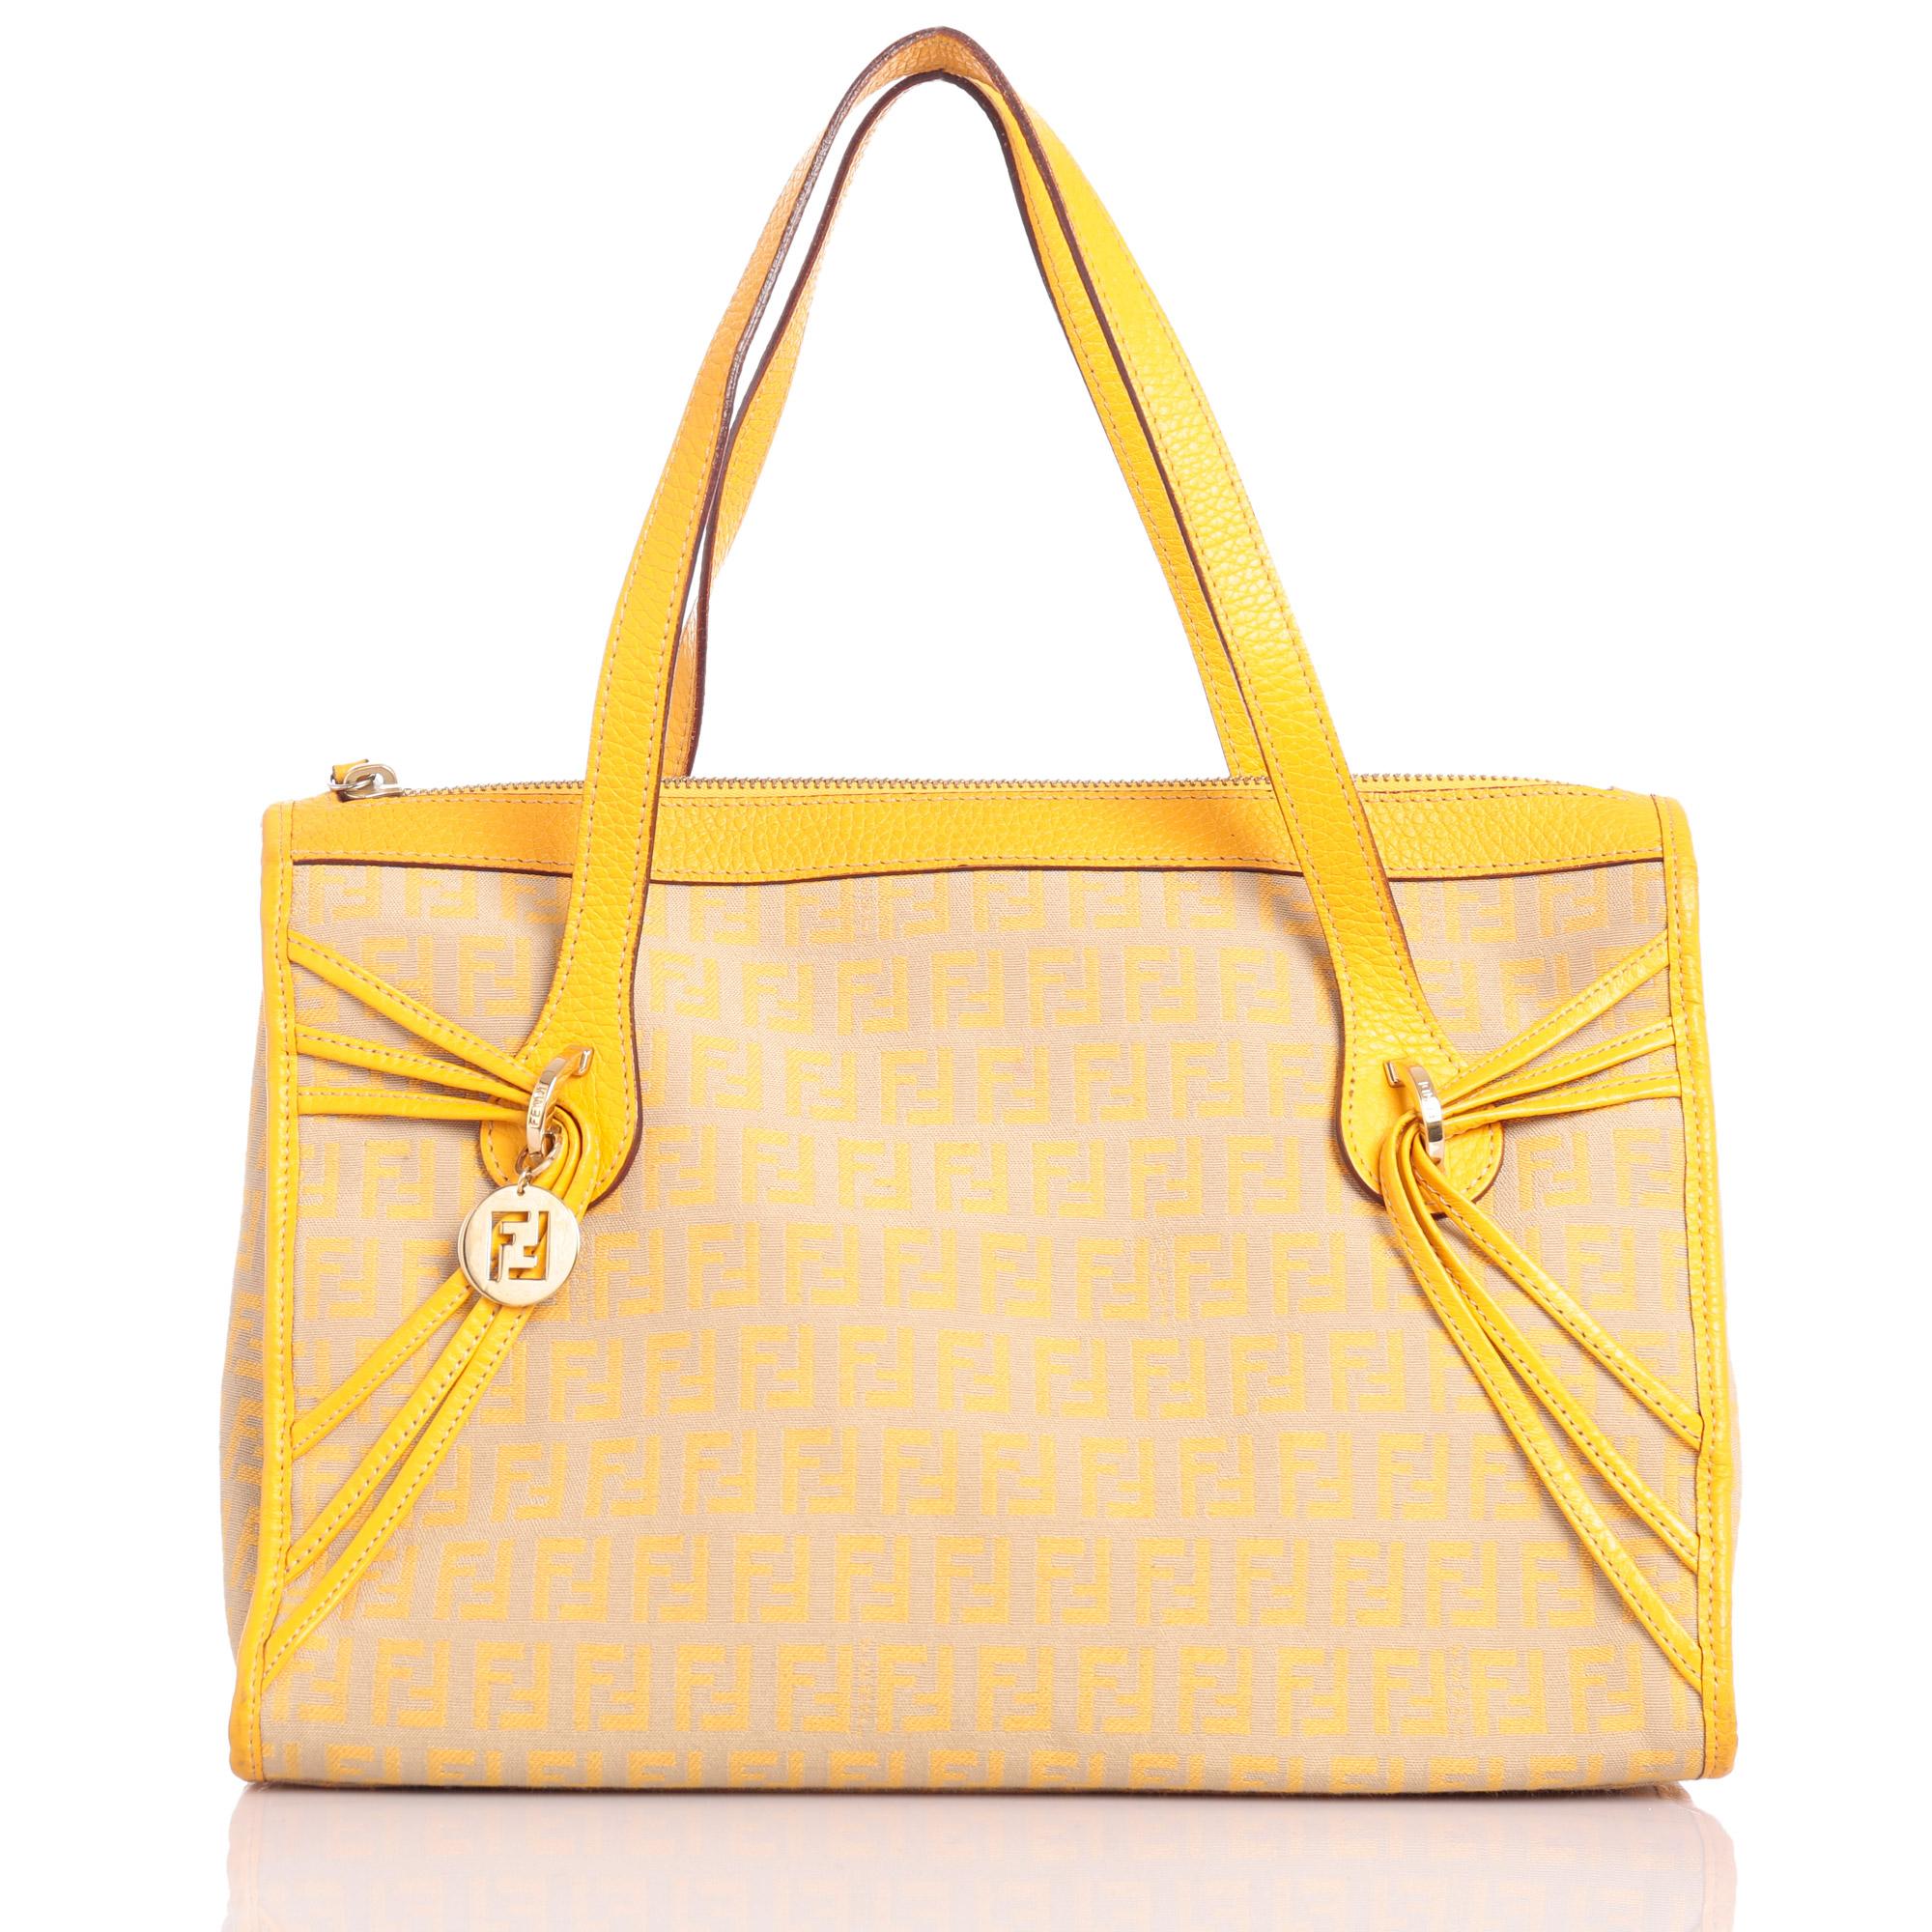 fendi nappa mini peekaboo satchel yellow 96198 new product e59c7 ... 7b595e79c7be9